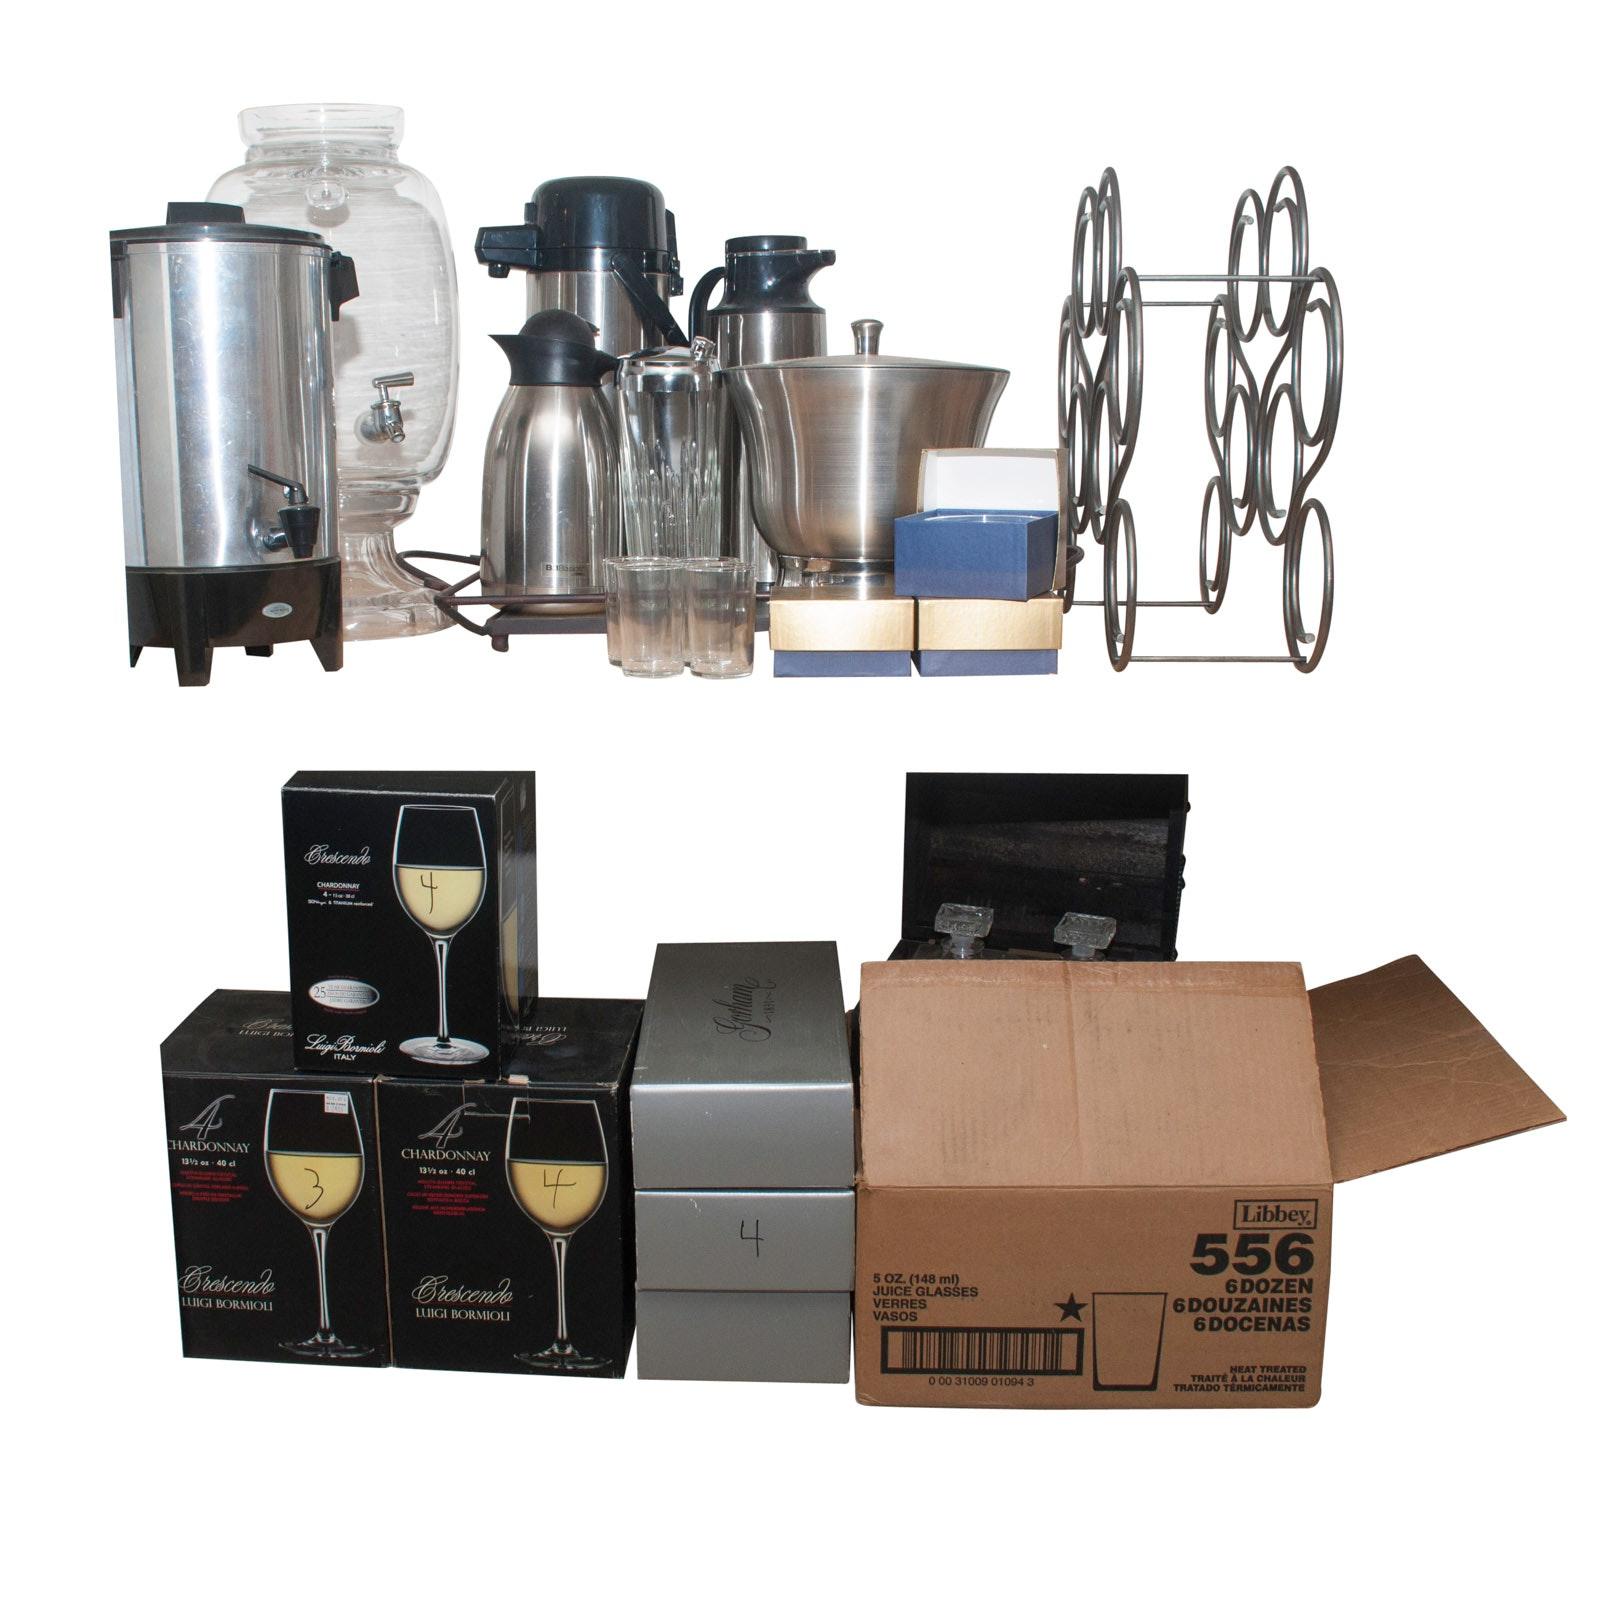 Beverage and Barware Assortment